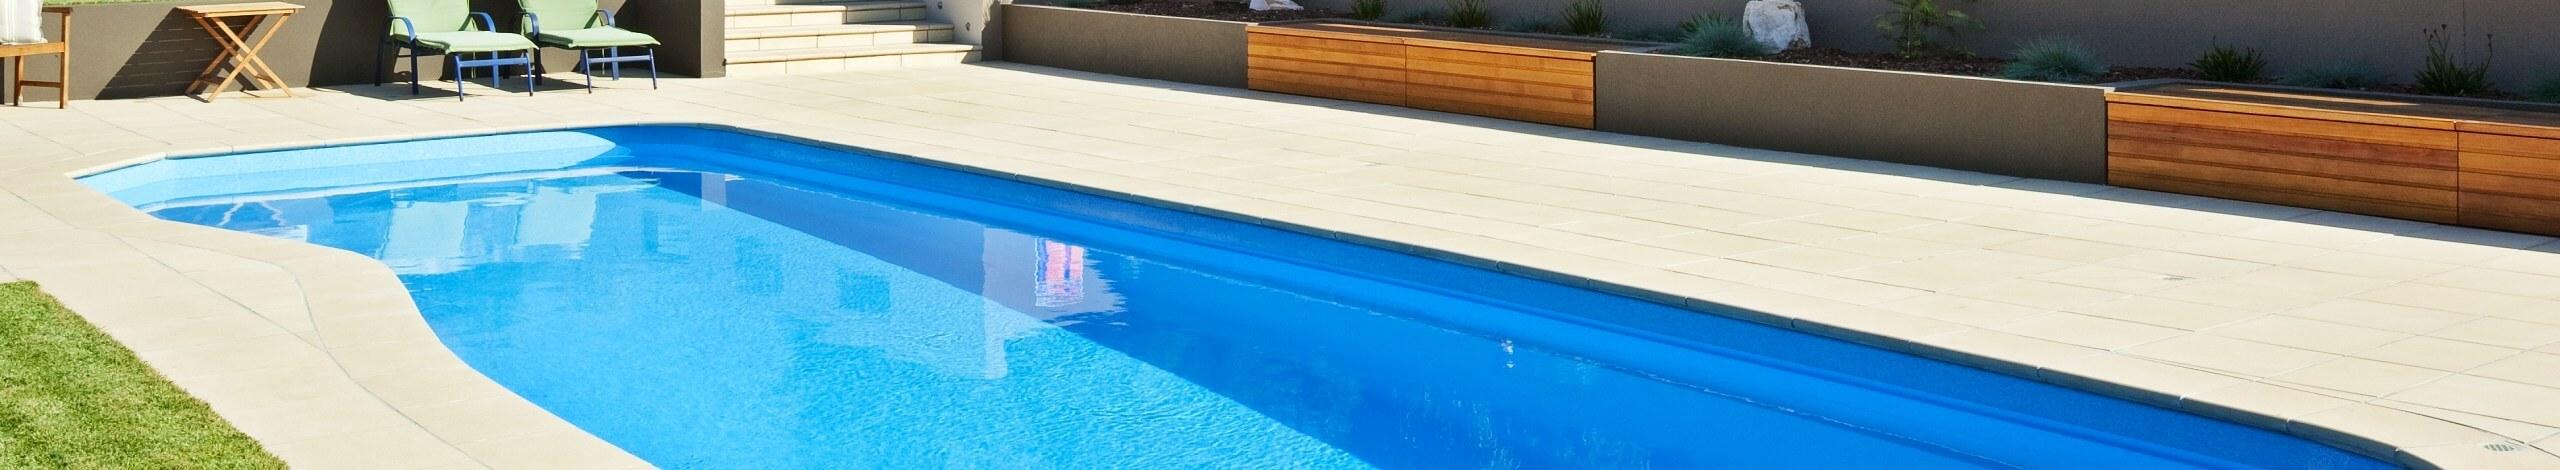 Riviera Fibreglass Pool Shape Header